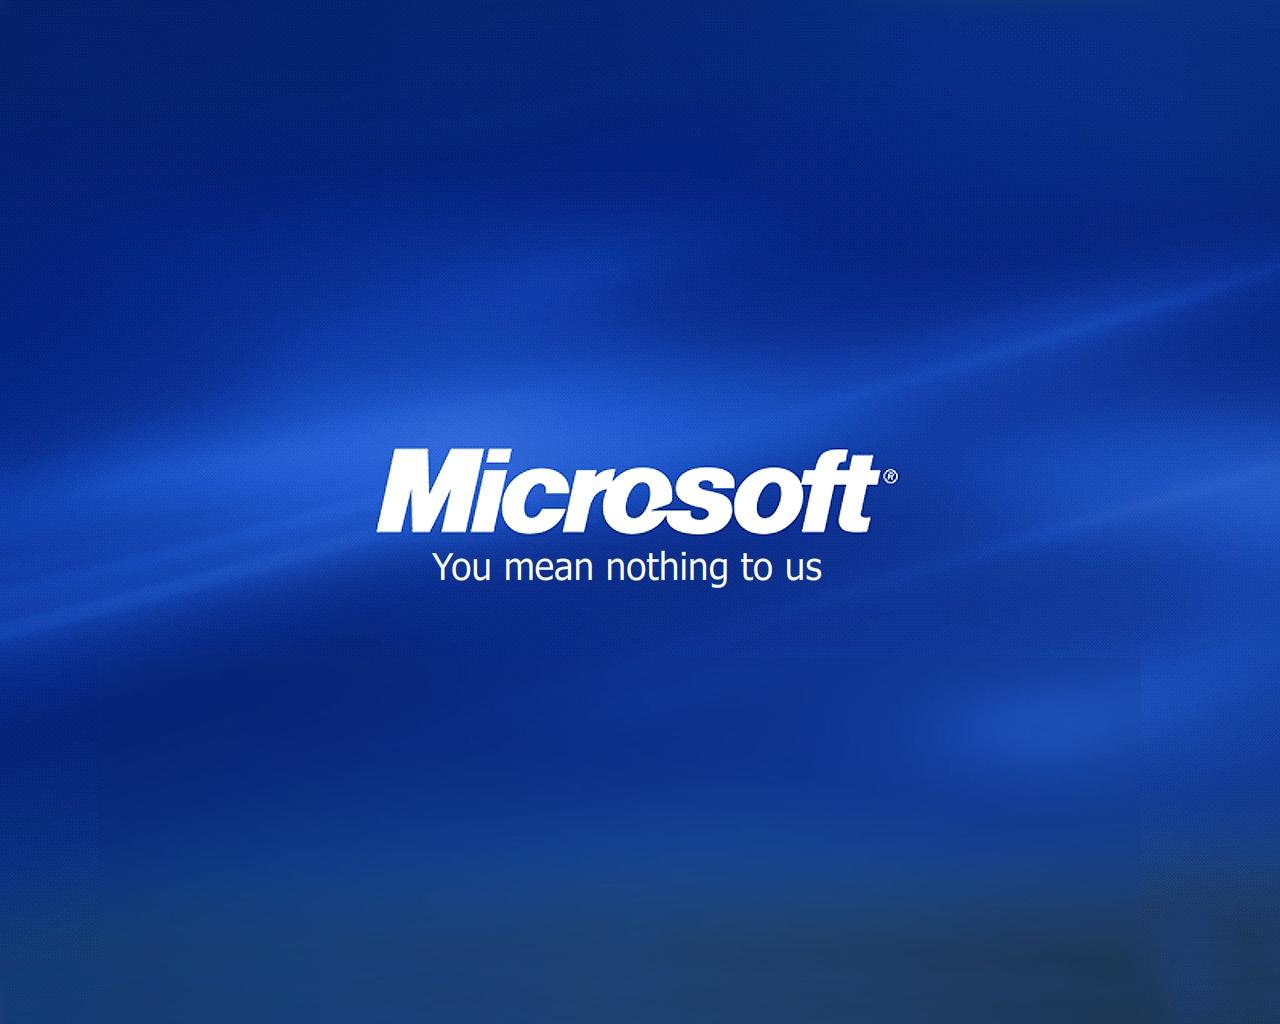 Free Microsoft Desktop Wallpaper Pictures